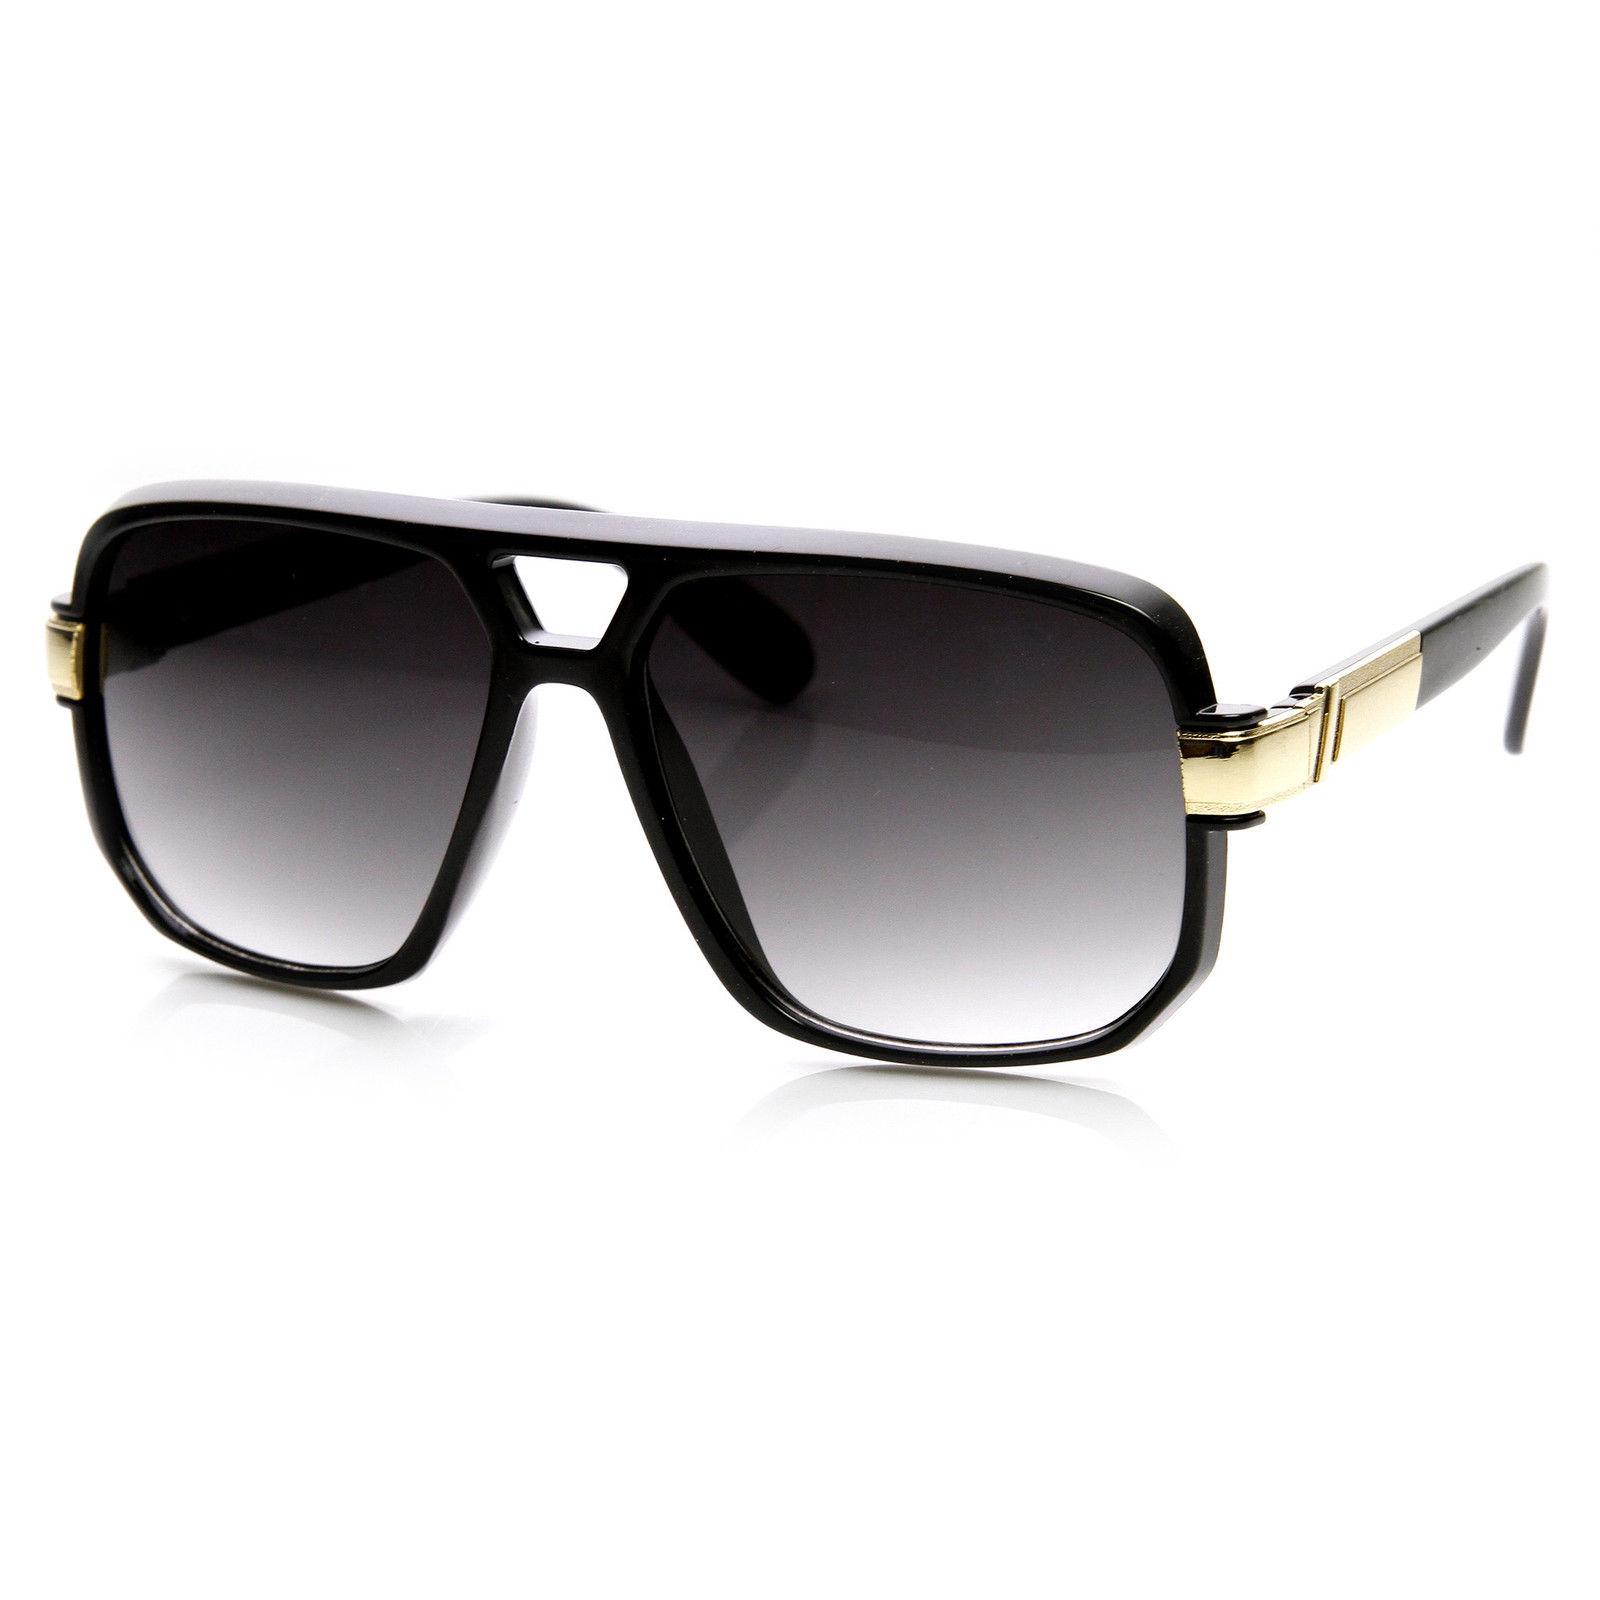 square frame aviators  Classic Square Frame Aviator Sunglasses \u2013 Uno \u0026 Company